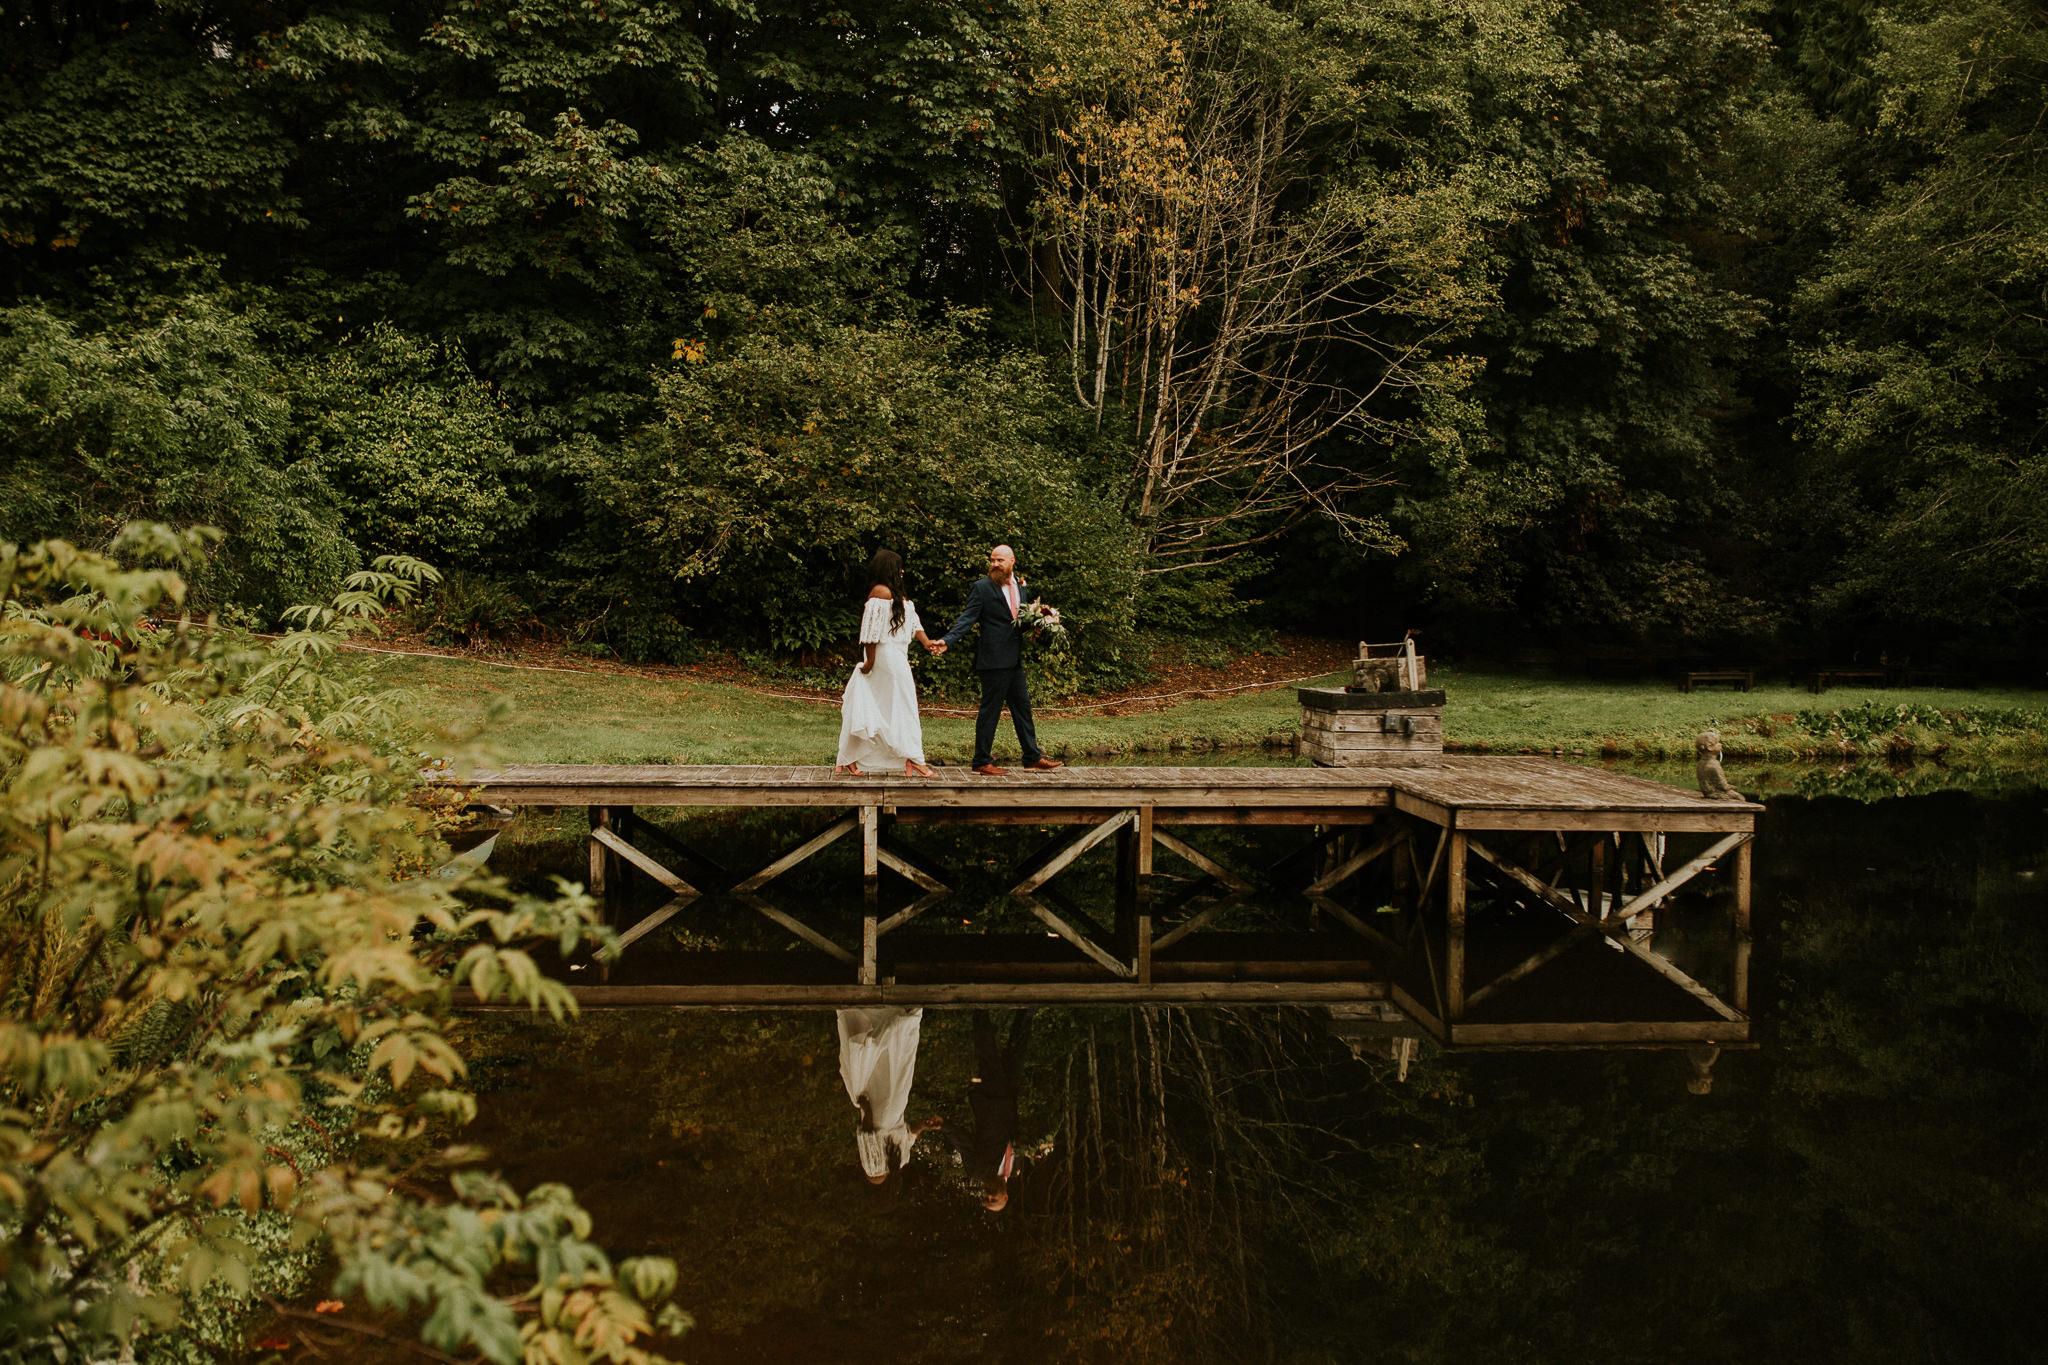 Lakeside-elopement-teasers-17.jpg